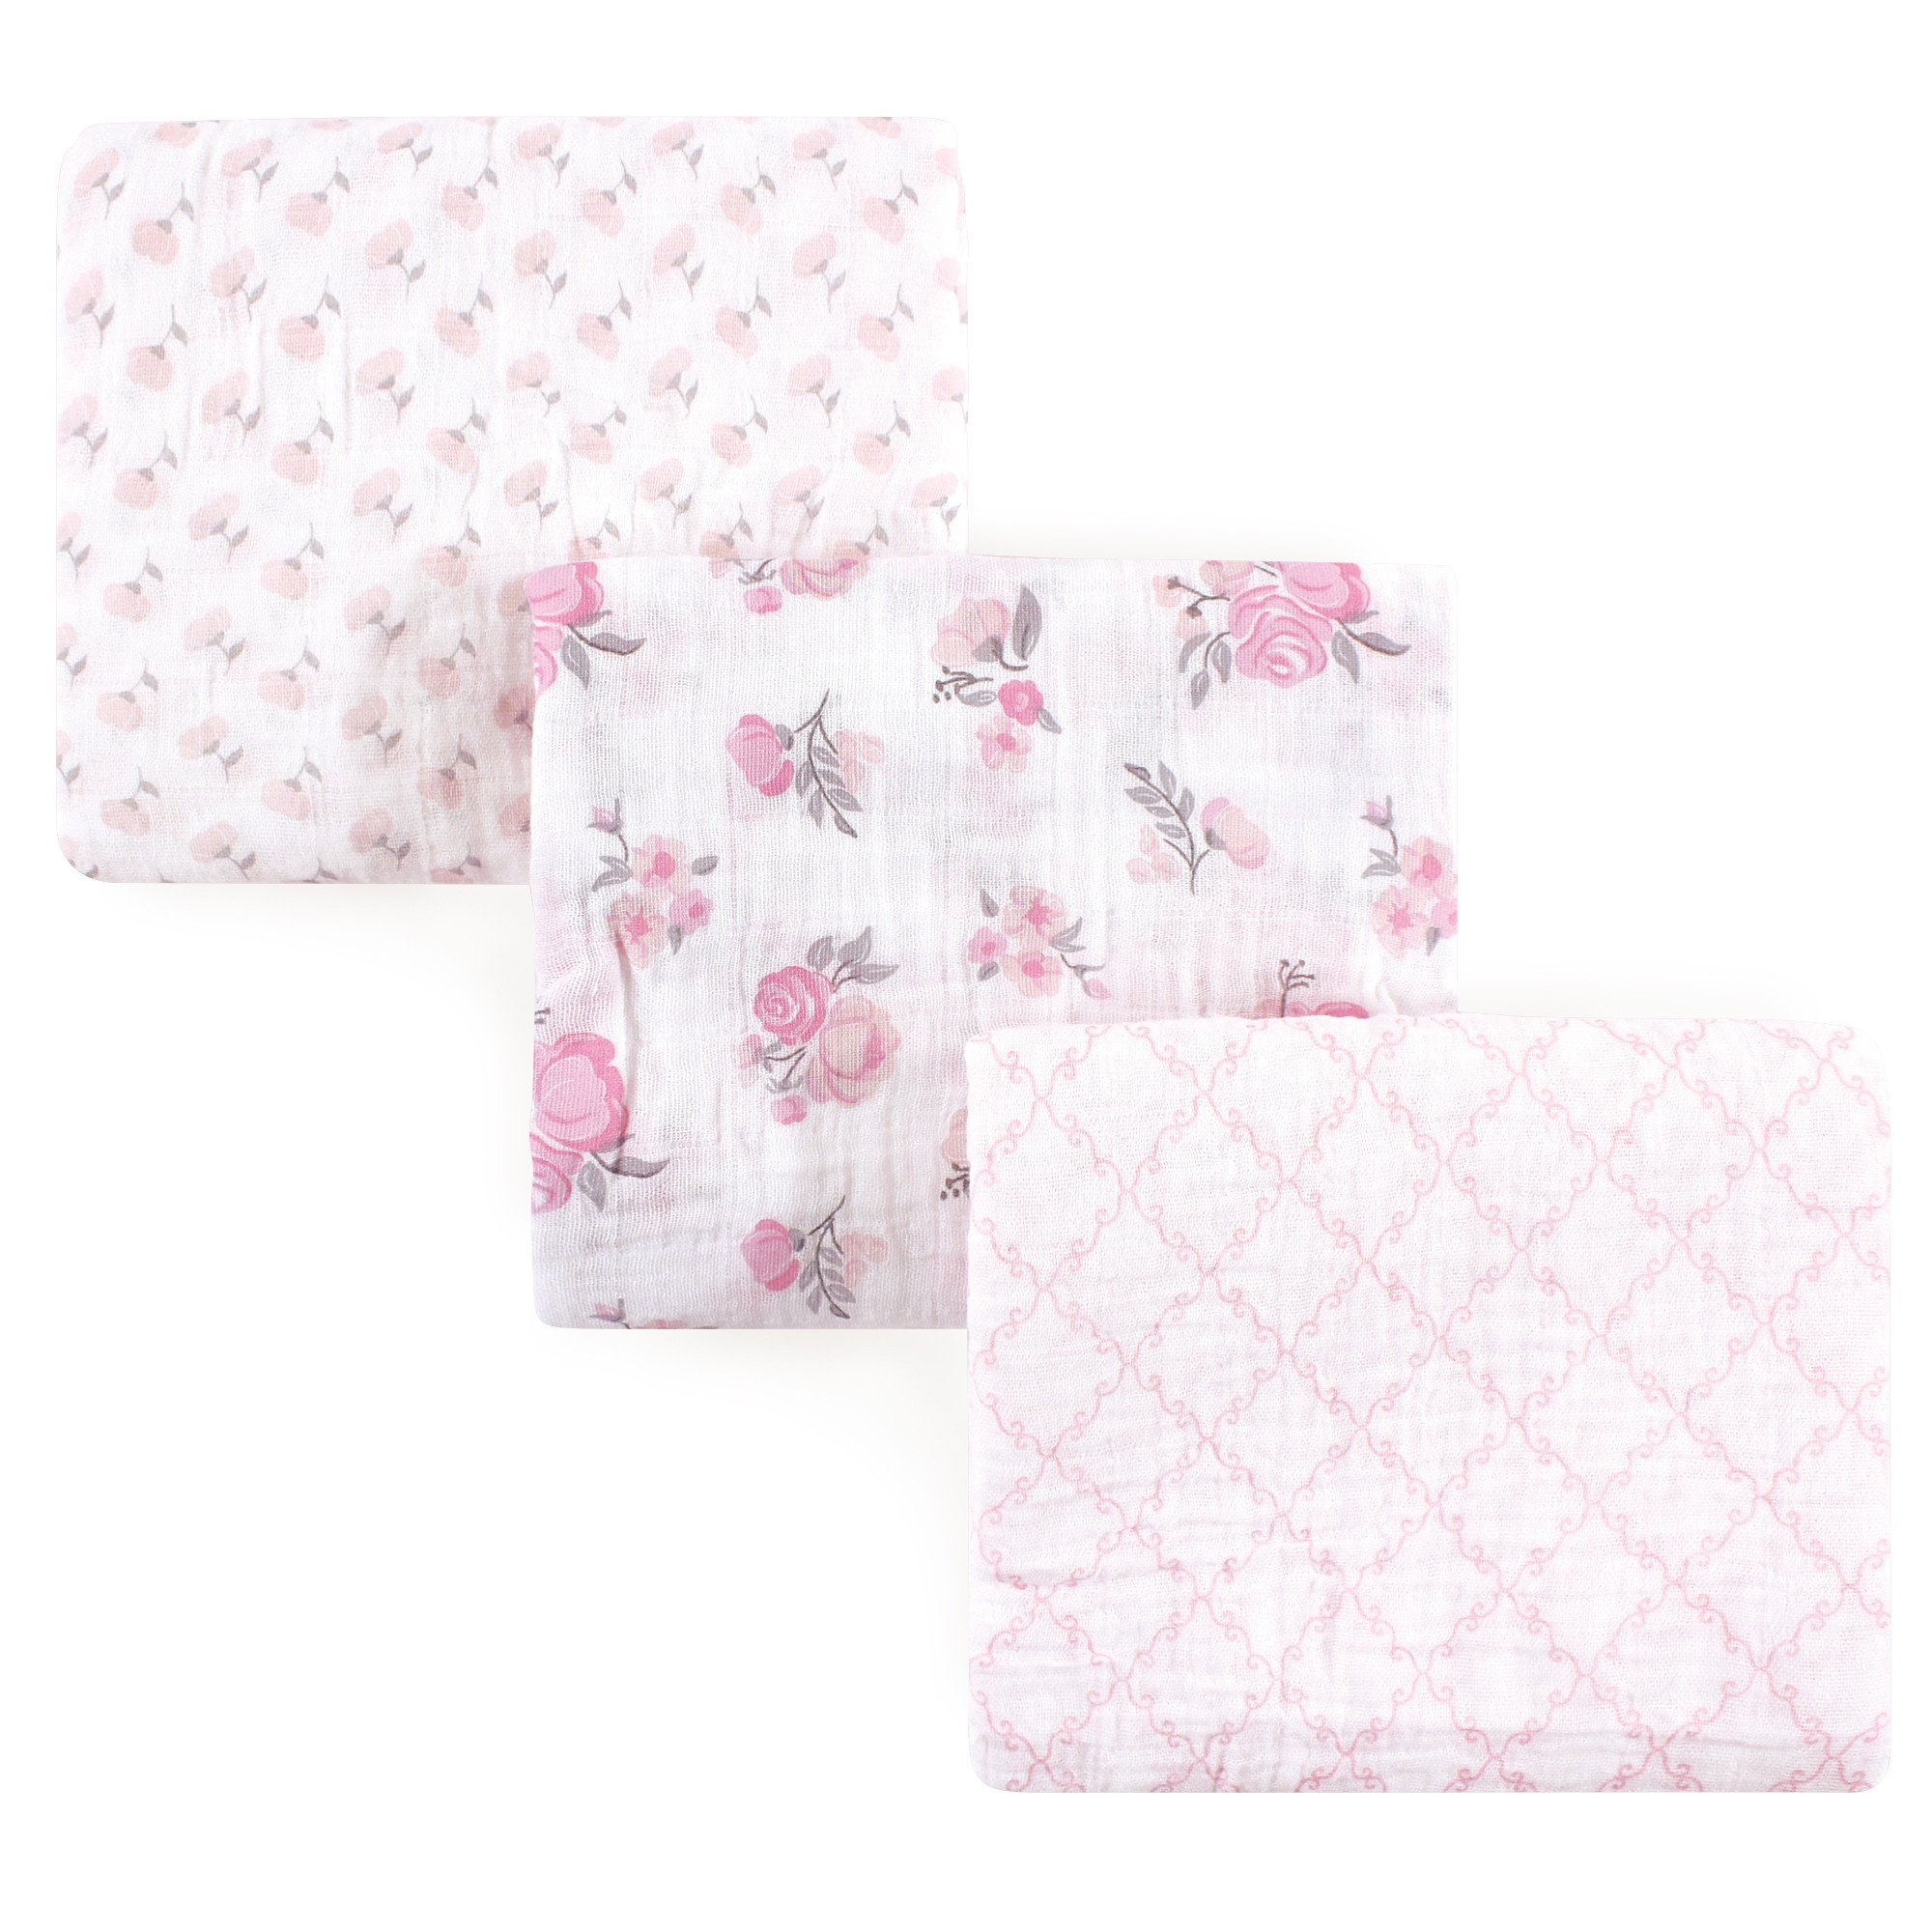 Hudson Baby Muslin Swaddle Blankets, 3 Pack, Pastel Floral